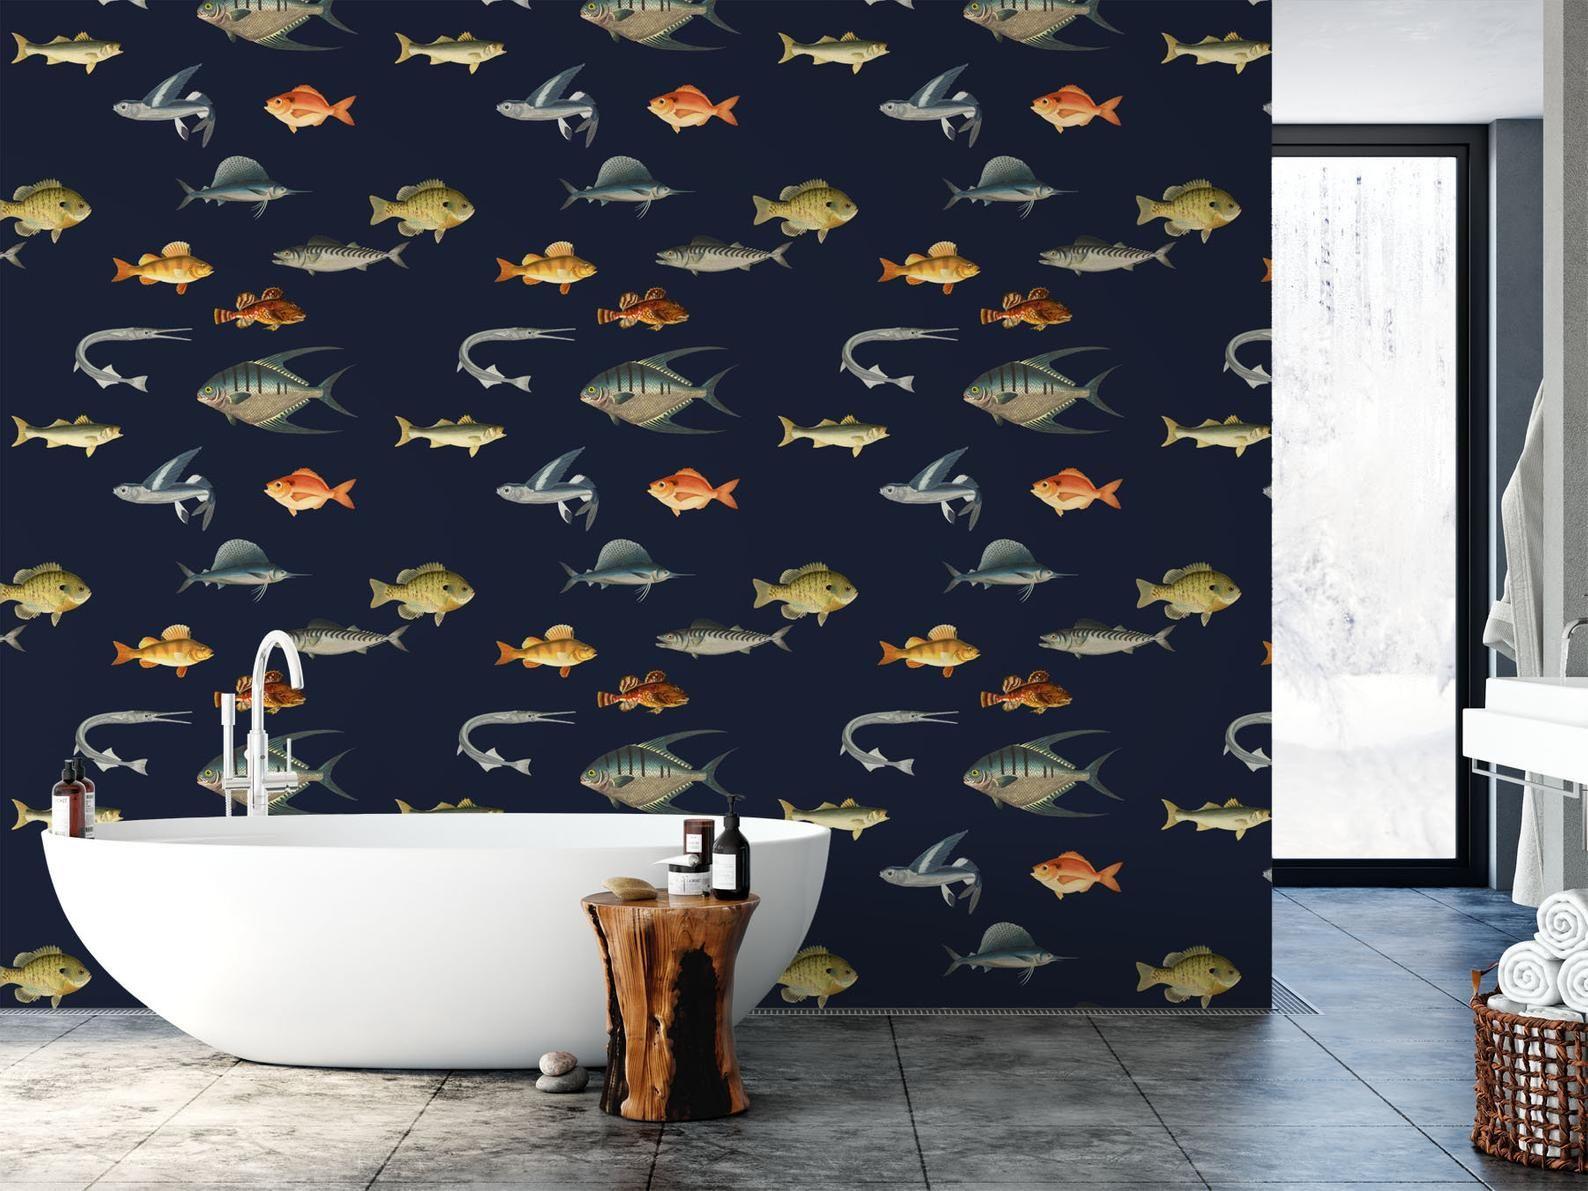 Ocean Wallpaper Removable Nautical Wallpaper Fish Wallpaper Etsy Modern Wallpaper Nautical Wallpaper Ocean Wallpaper